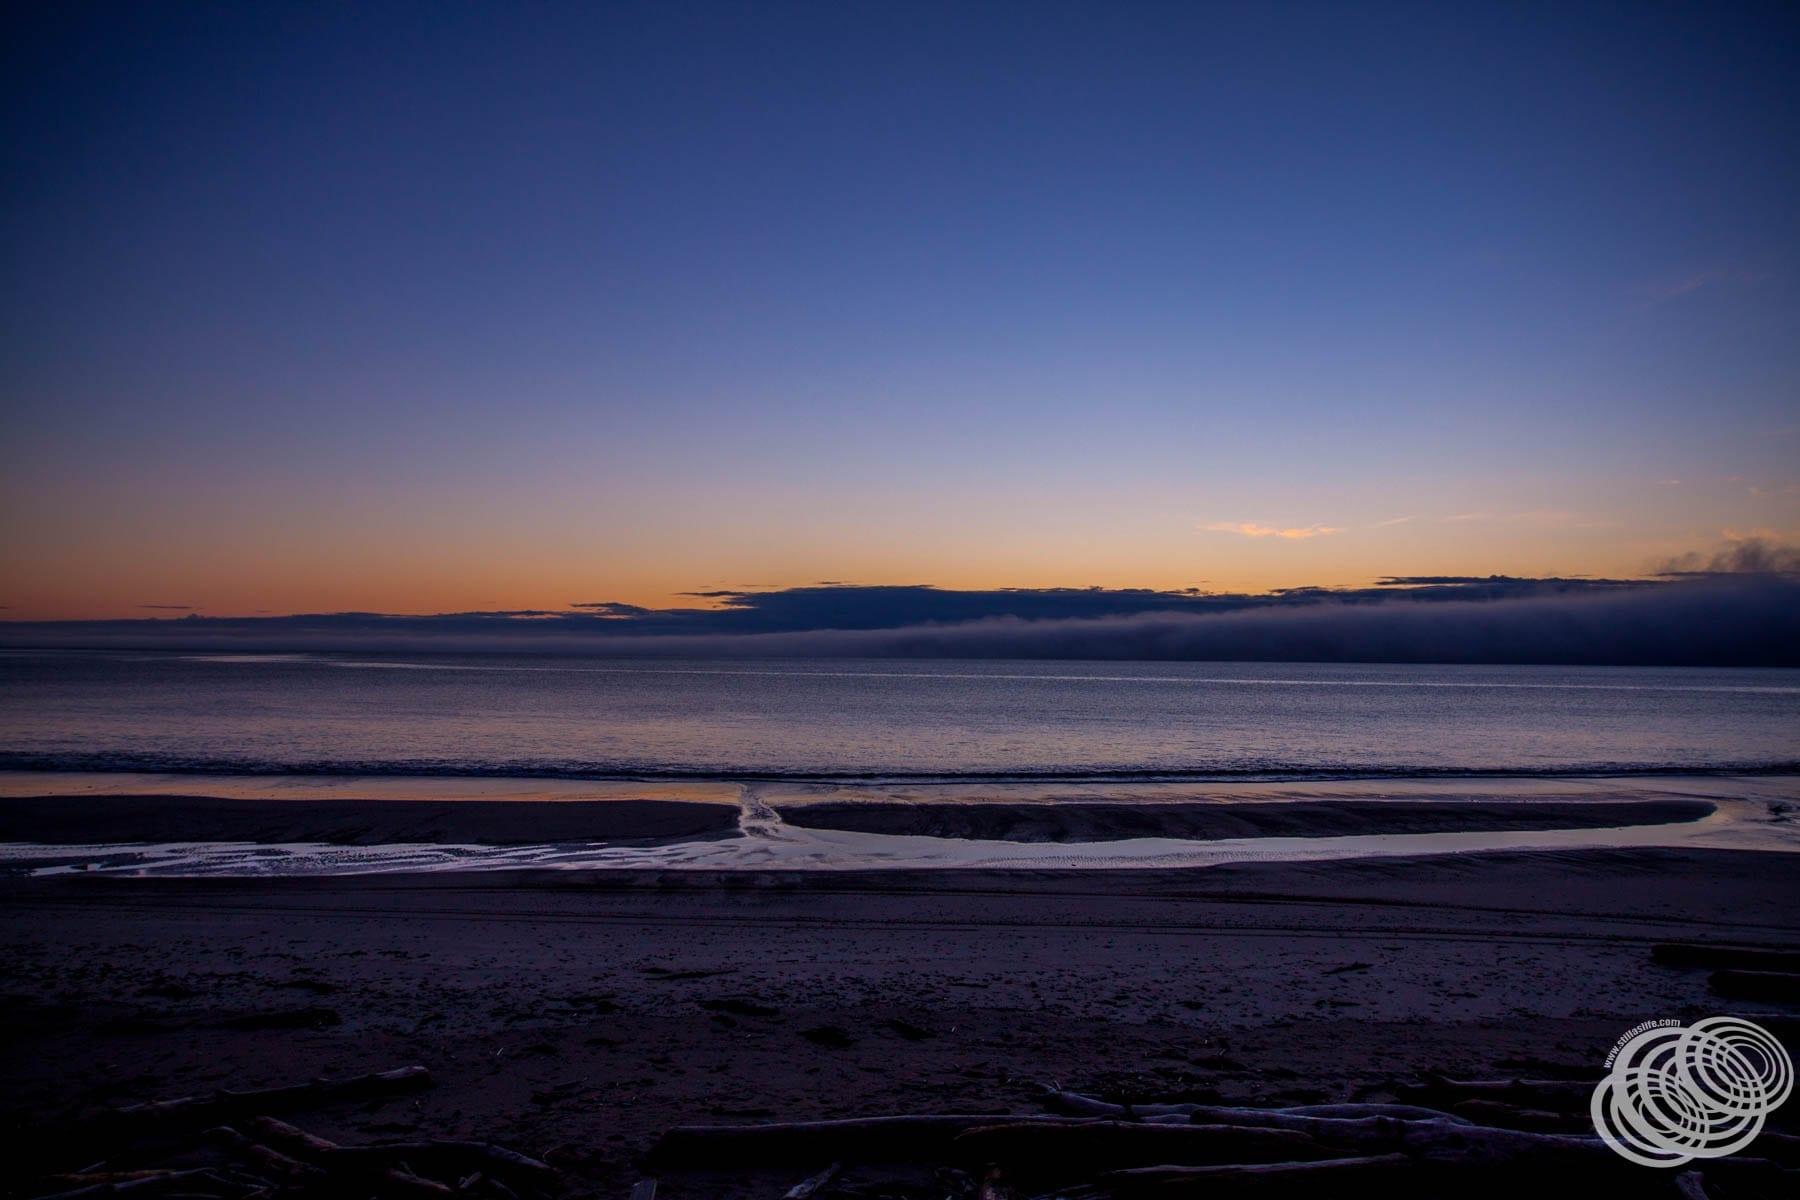 Sunset at Mahia Beach